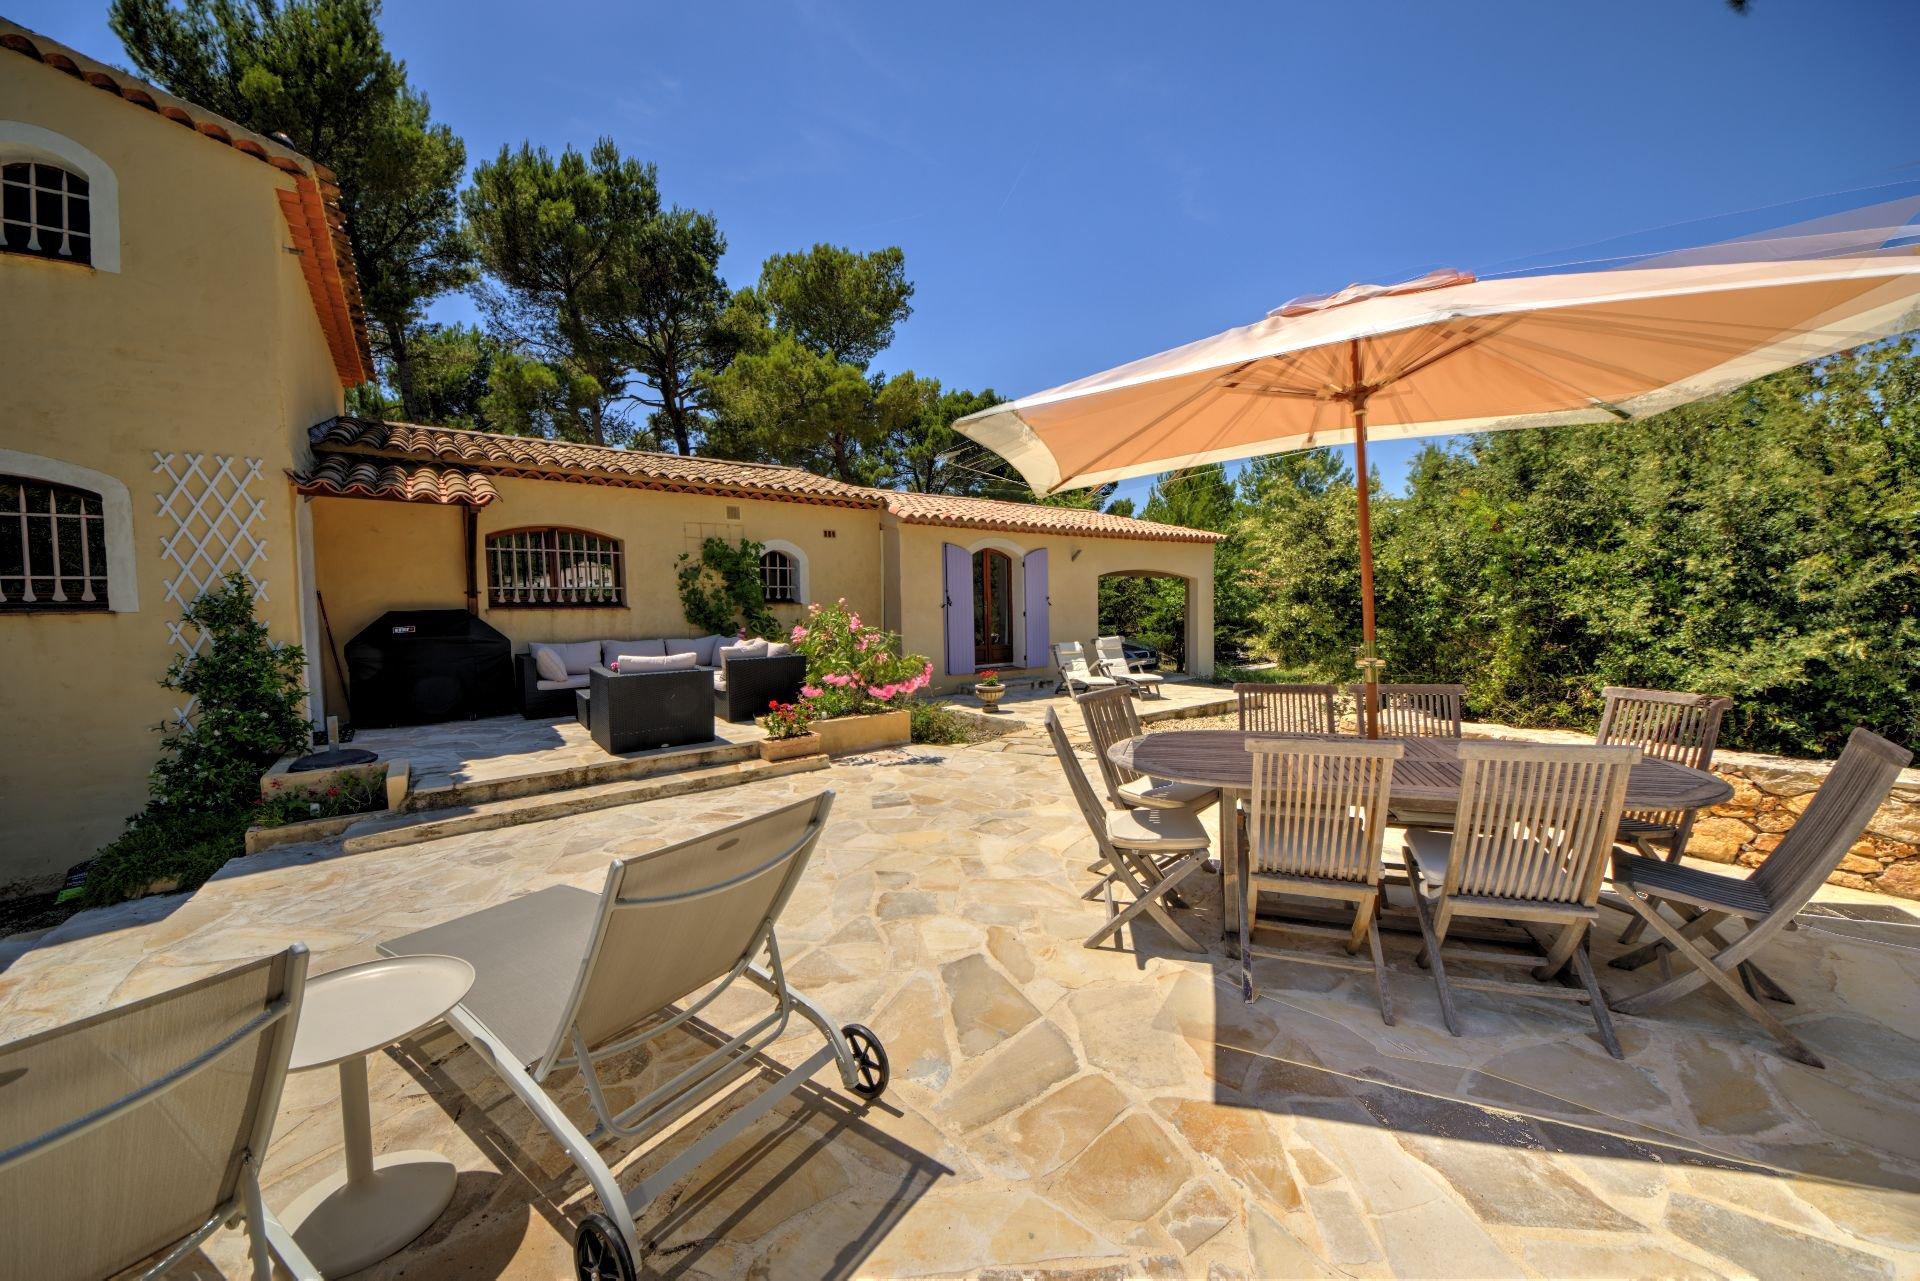 Pool Beach Beautiful villa of 180 sqm, three bedrooms, swimming pool, on 4000 m² closed, Tourtour, Var, Provence